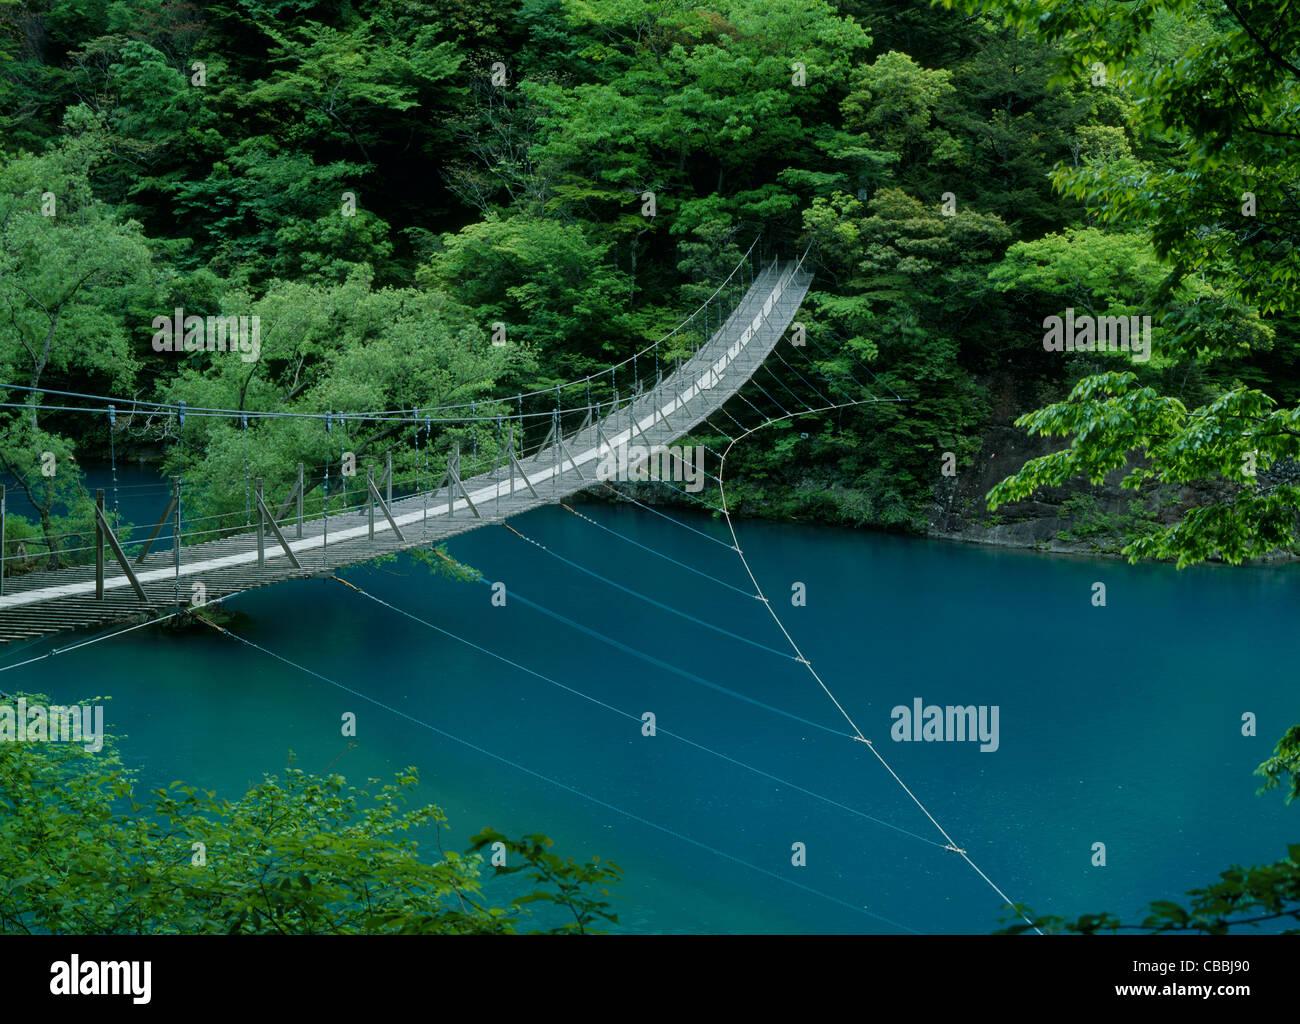 Sumata Gorge and Dream Suspension Bridge, Kawanehon, Shizuoka, Japan - Stock Image